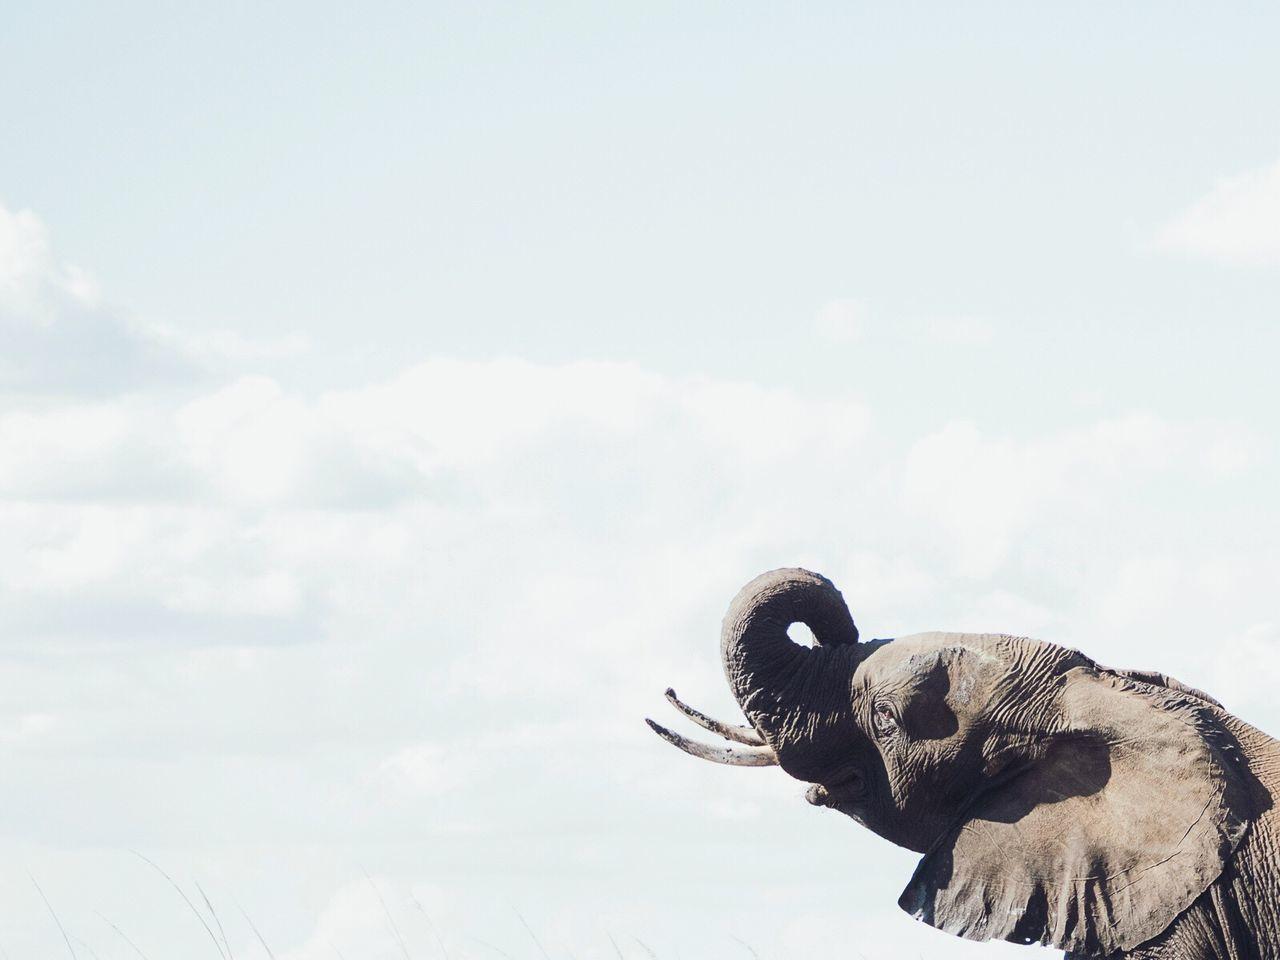 Happy elephant! Nature Elephant Botswana Outdoors Sky No People Animal Themes Day Tusks And Trunk